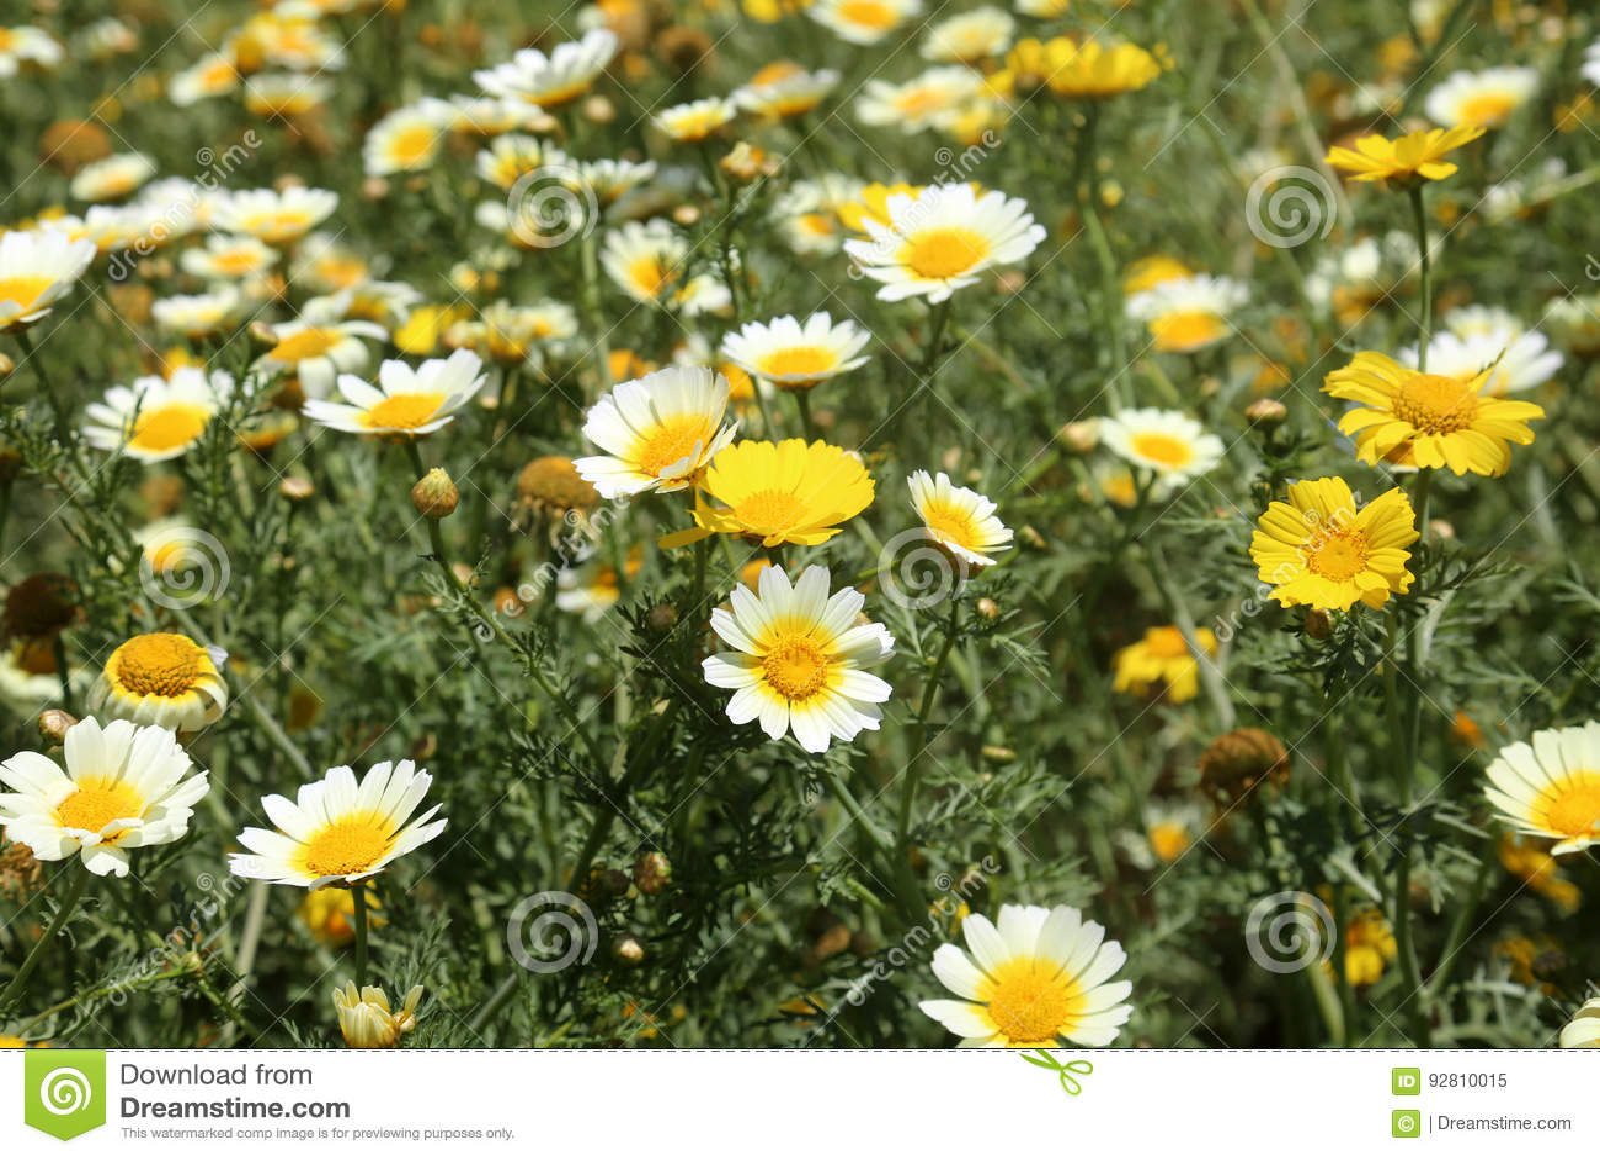 California wild flowers daisies stock image image of national download california wild flowers daisies stock image image of national beauty 92810015 izmirmasajfo